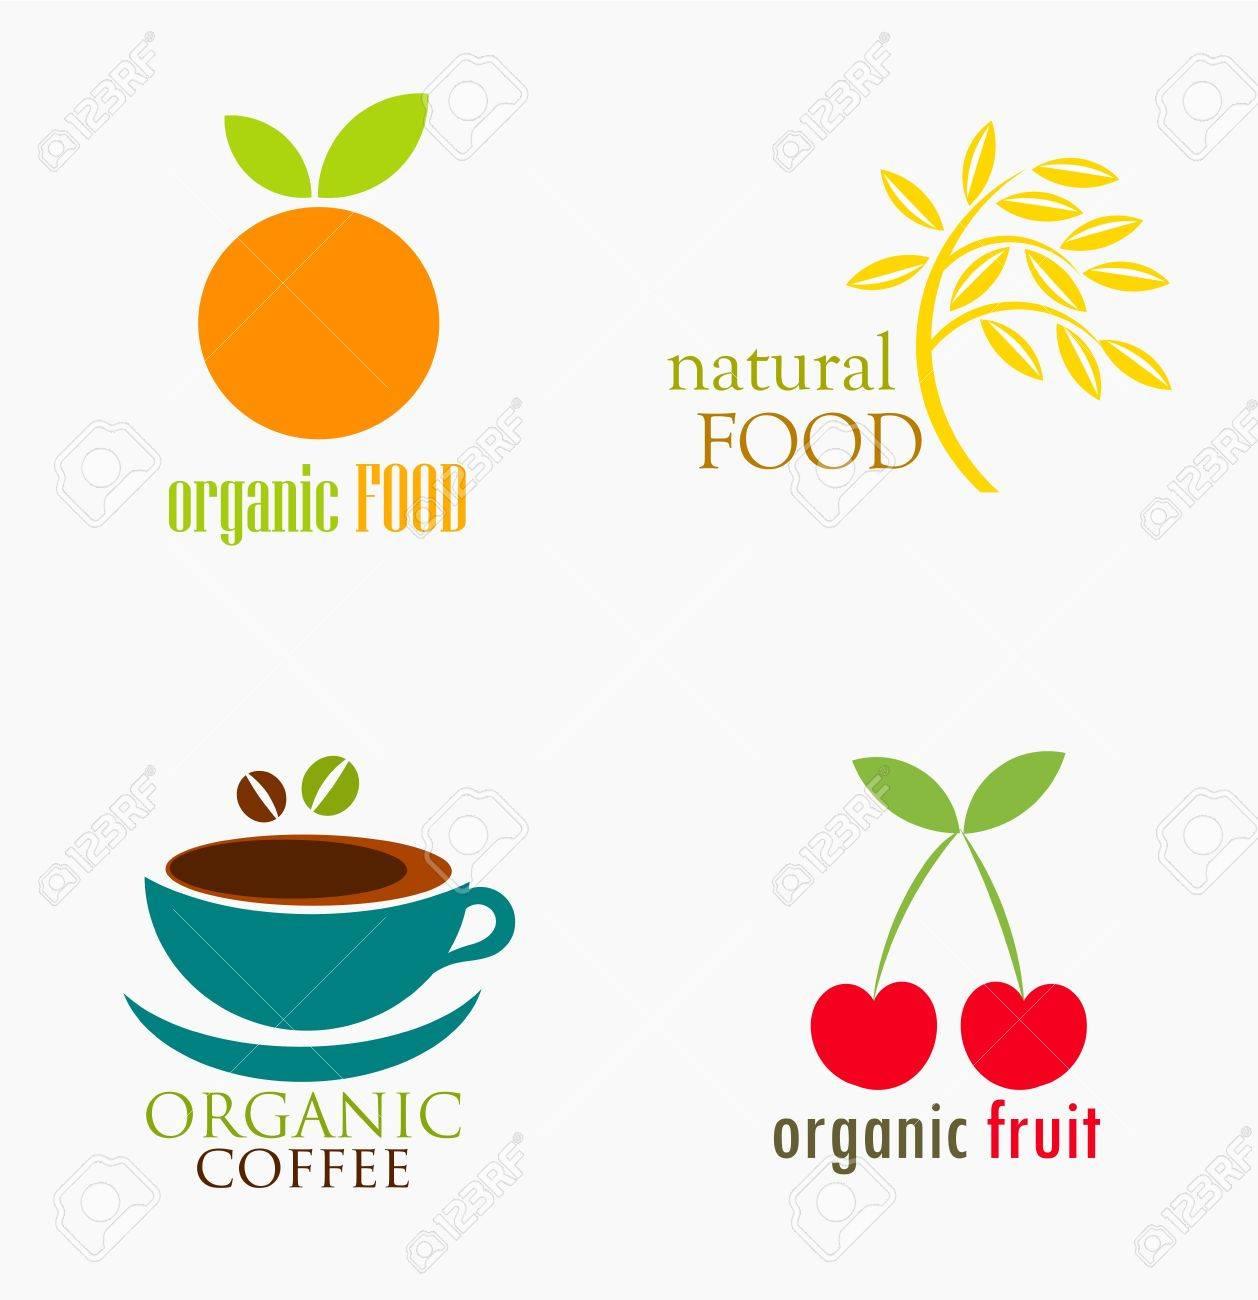 Set of organic and natural food symbols. Vector illustration Stock Vector - 17389822